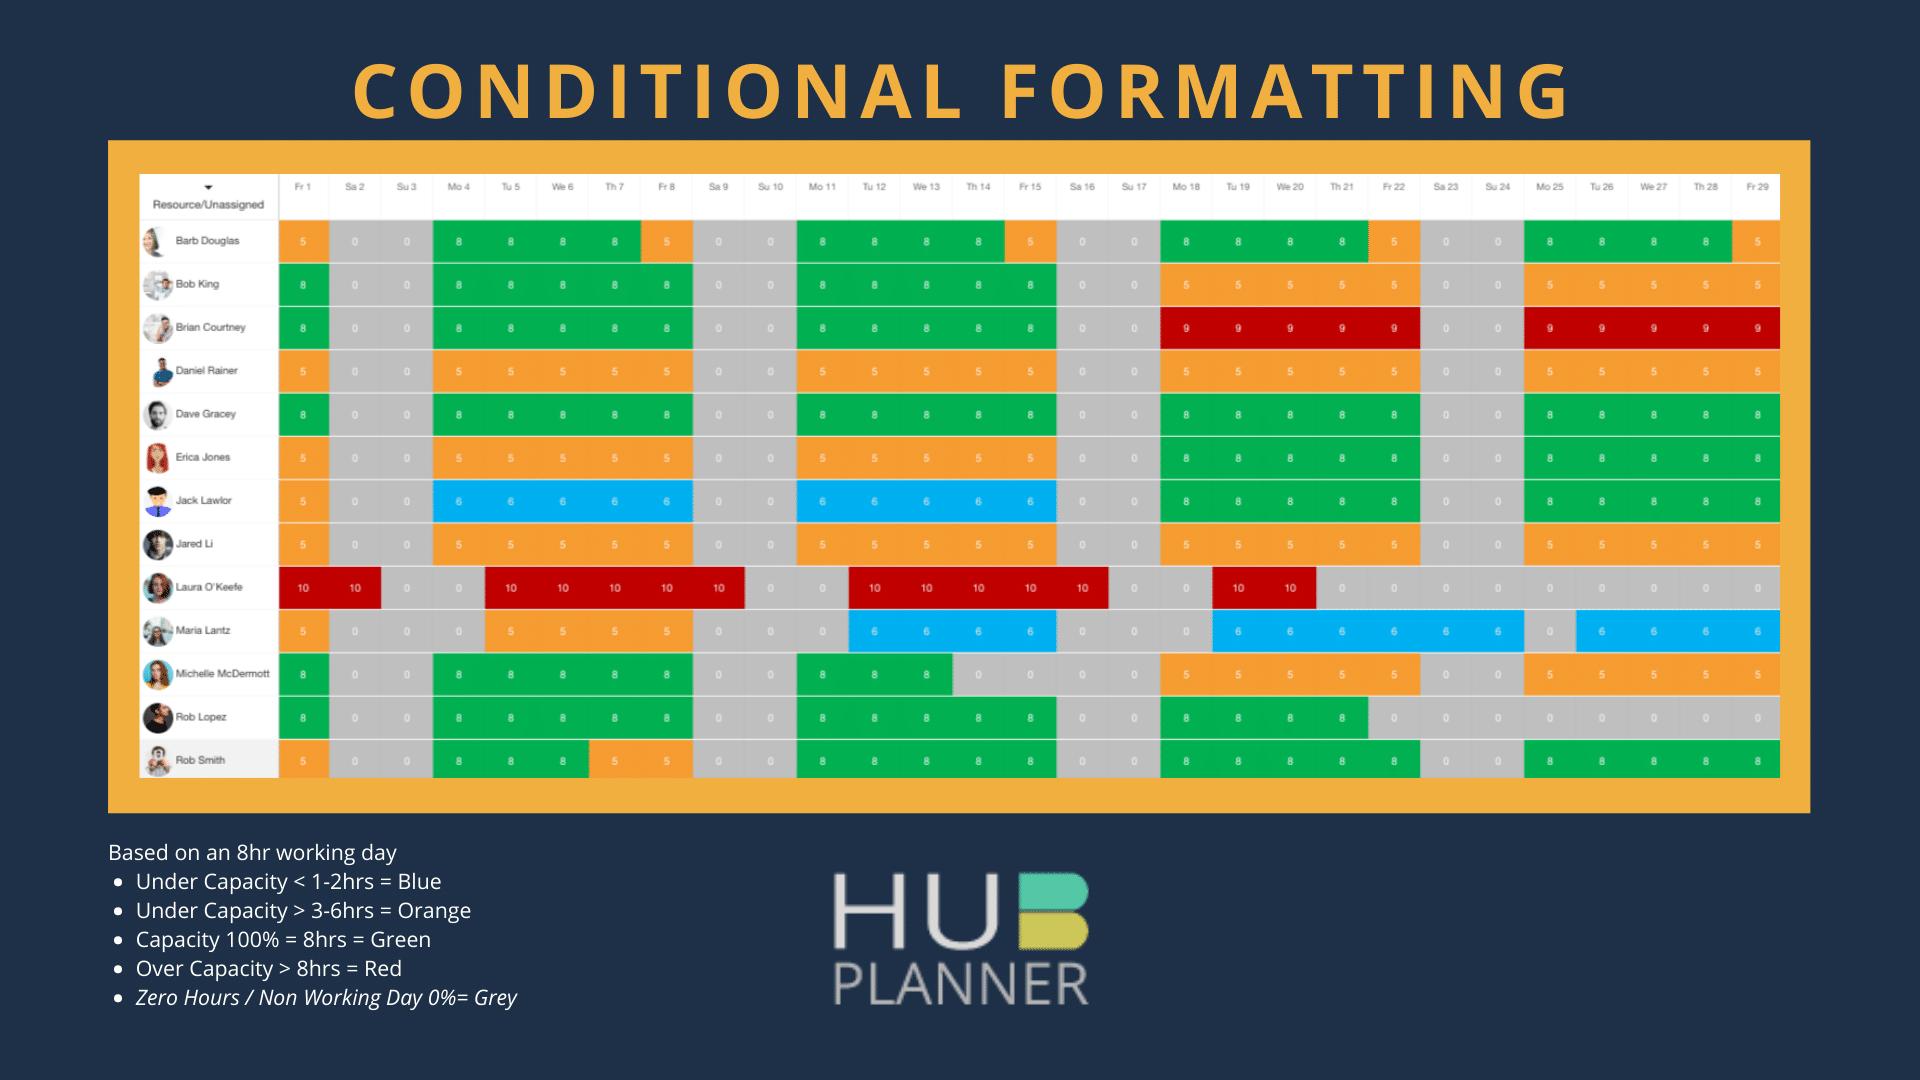 Heat Map Conditional Formatting